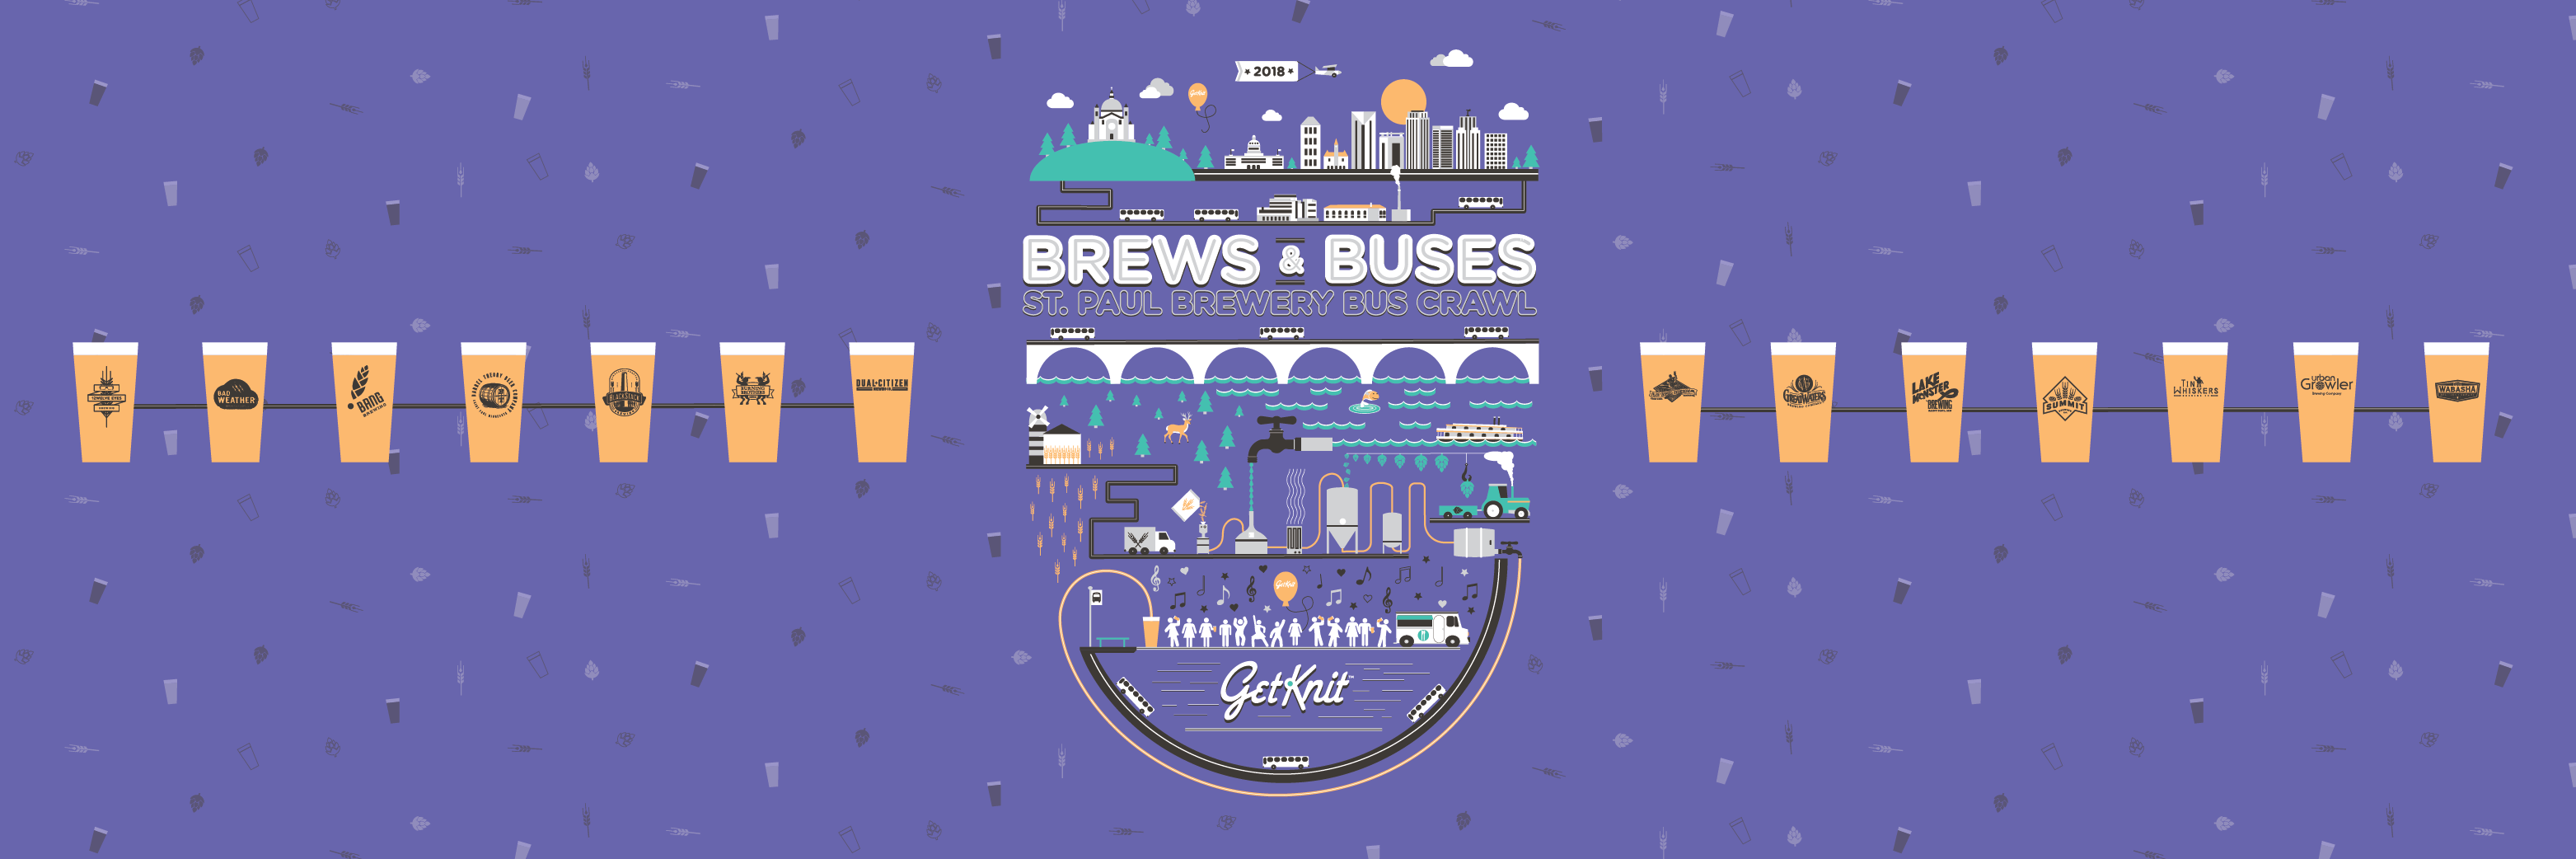 Brews-Buses-2018_Web-Banner-1500x500-01